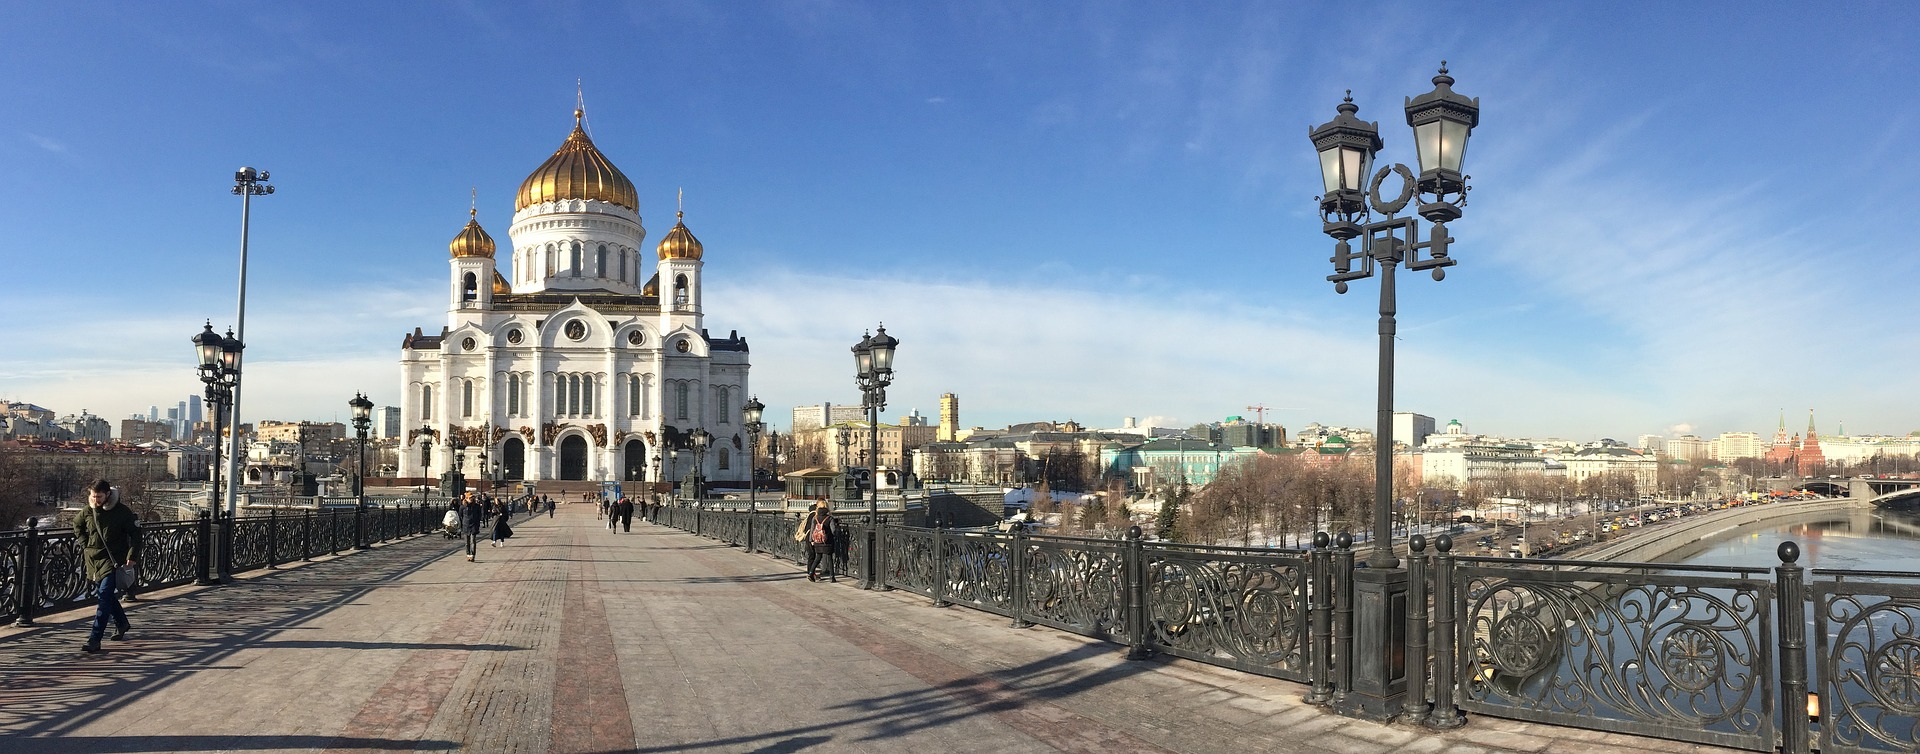 Marktanalyse Russland Kathedrale